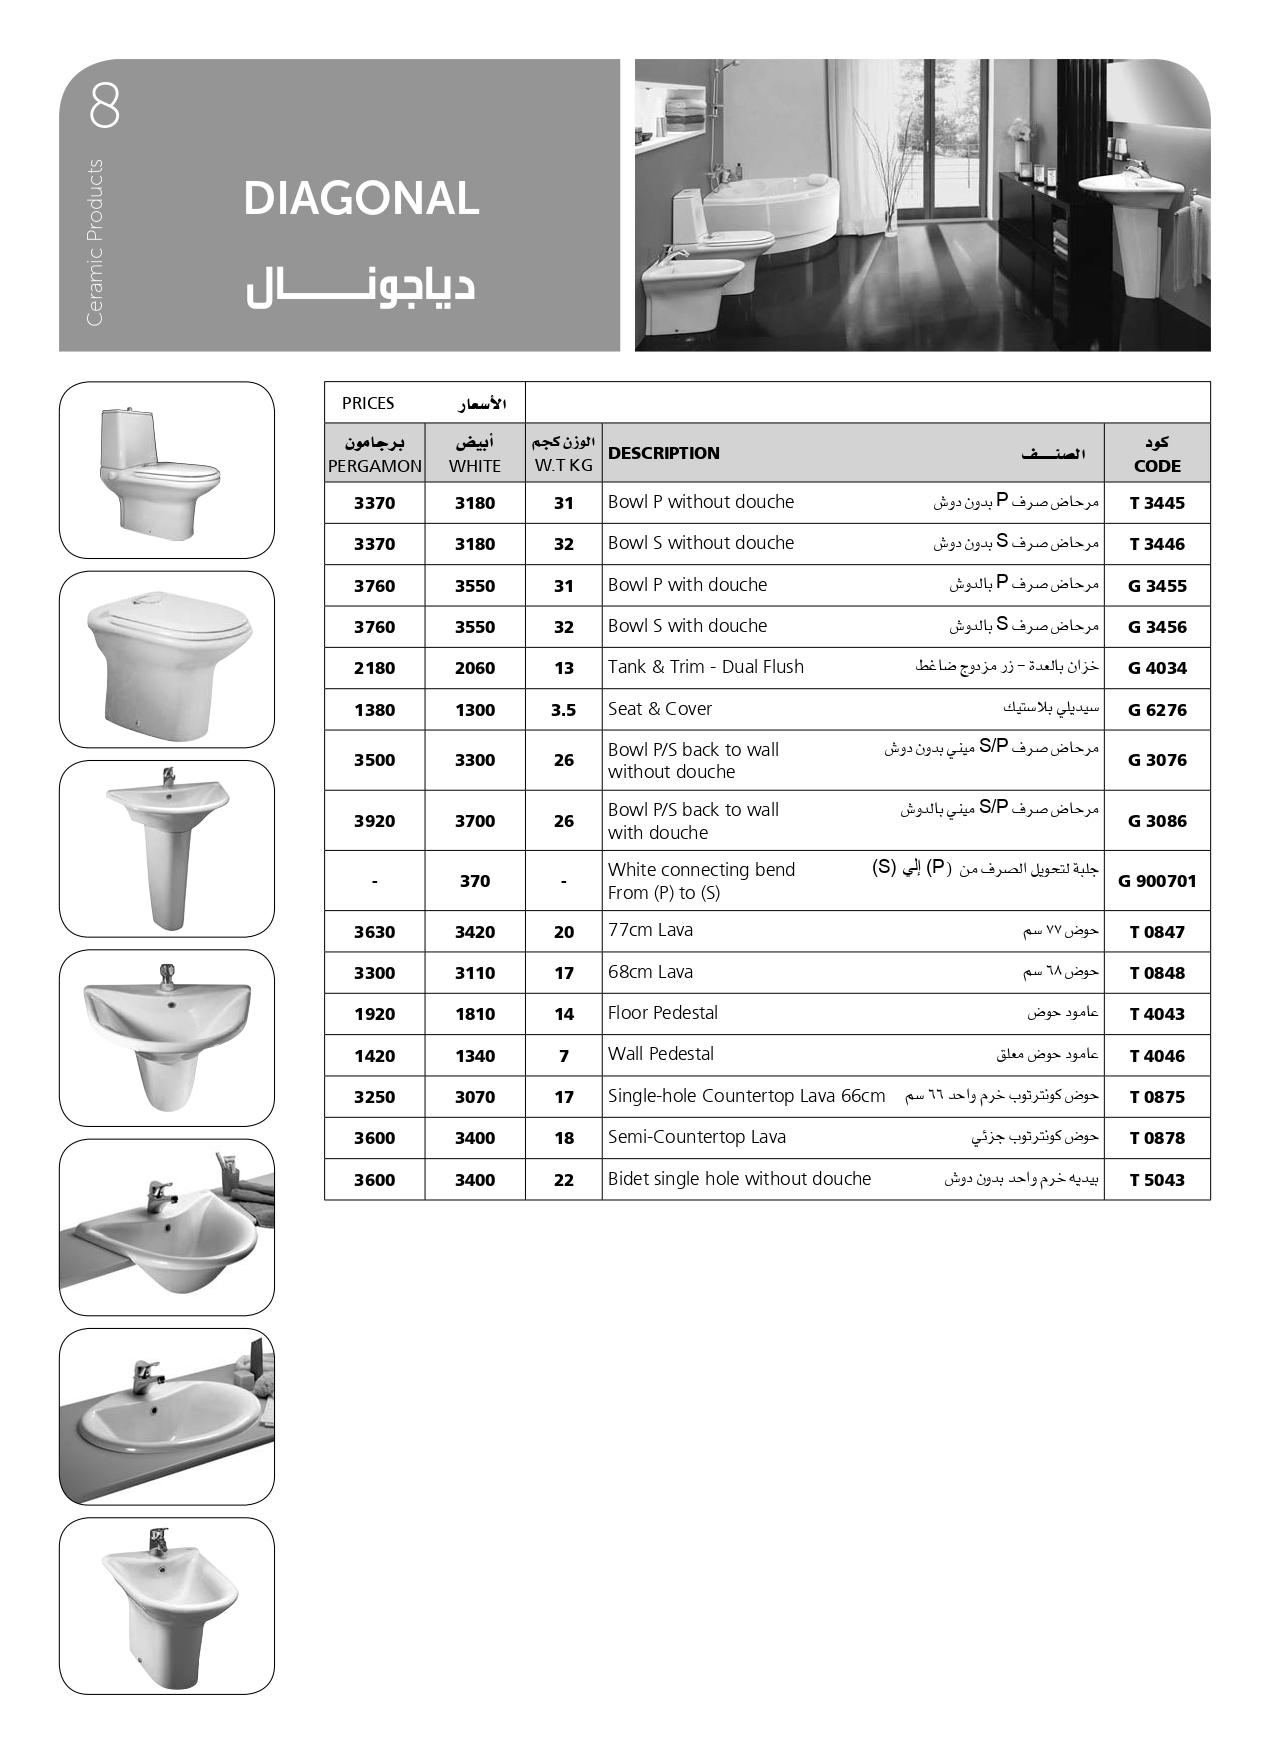 أسعار اطقم حمامات دياجونال ايديال ستاندرد 2020